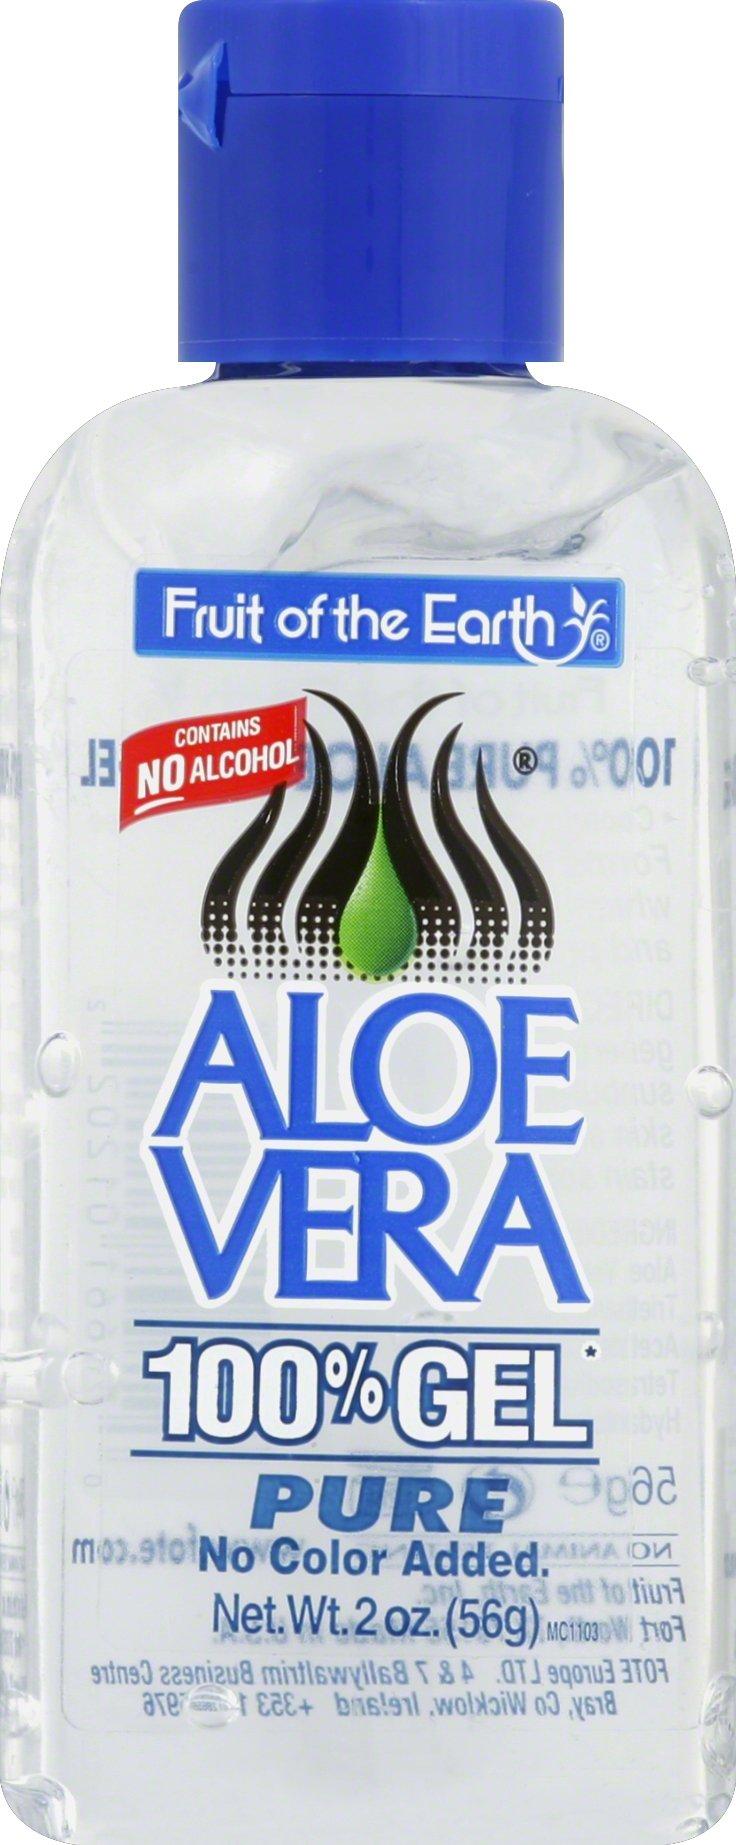 Fruit Of The Earth 100% Aloevera 2 oz. Gel